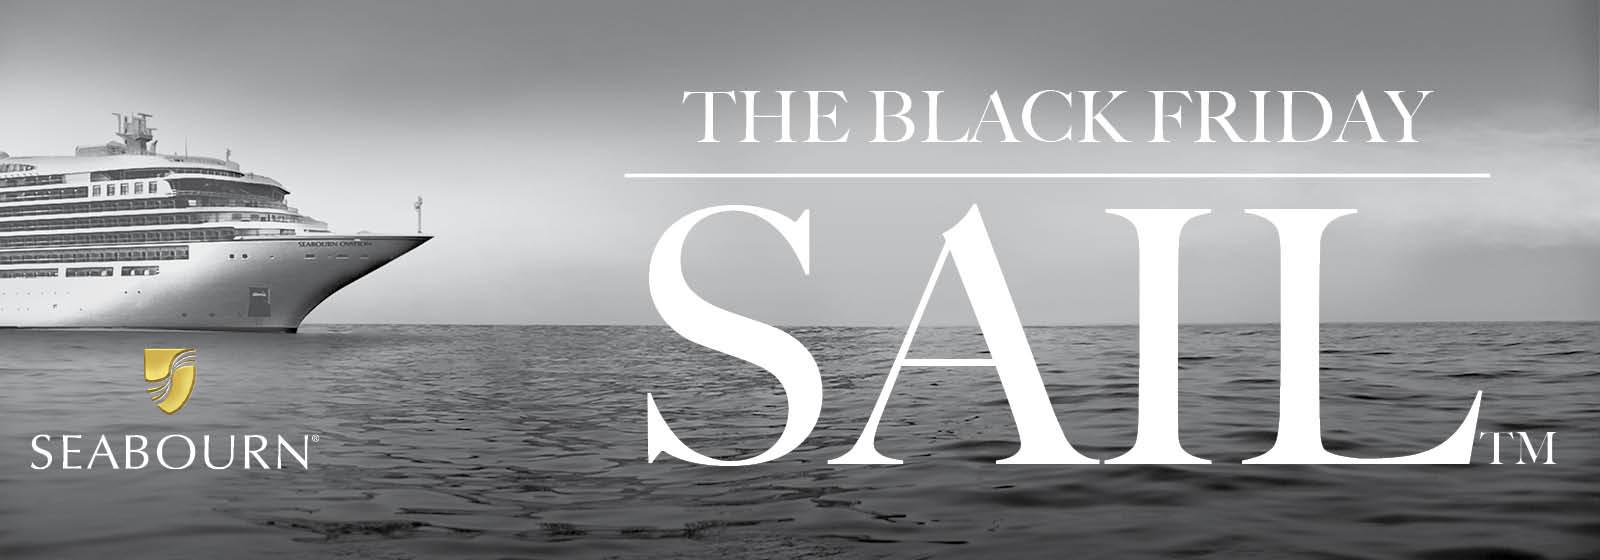 Seabourn - 10% Early Bonus Savings-3